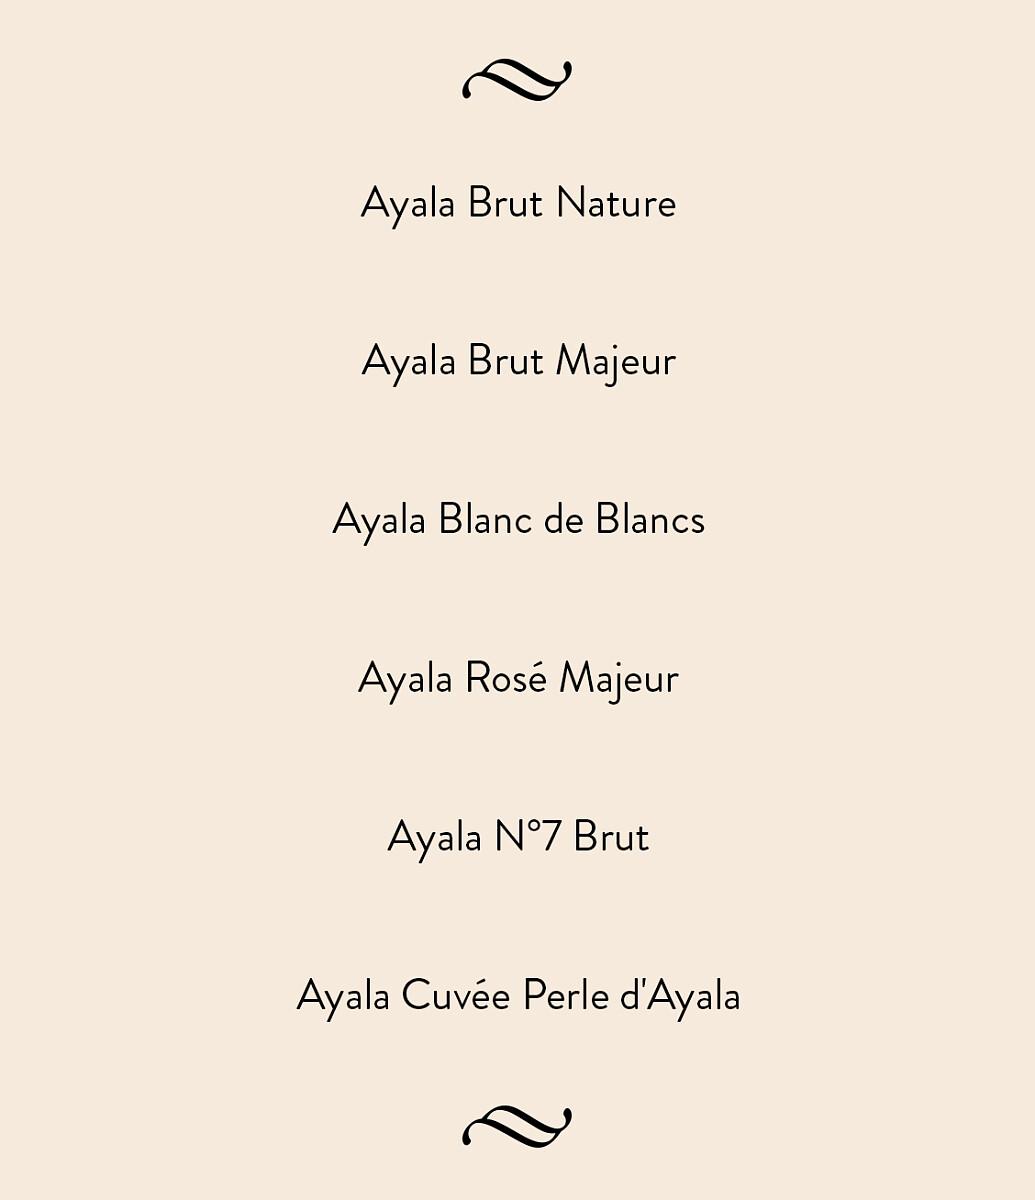 Ayala-vinliste.jpg [111.04 KB]